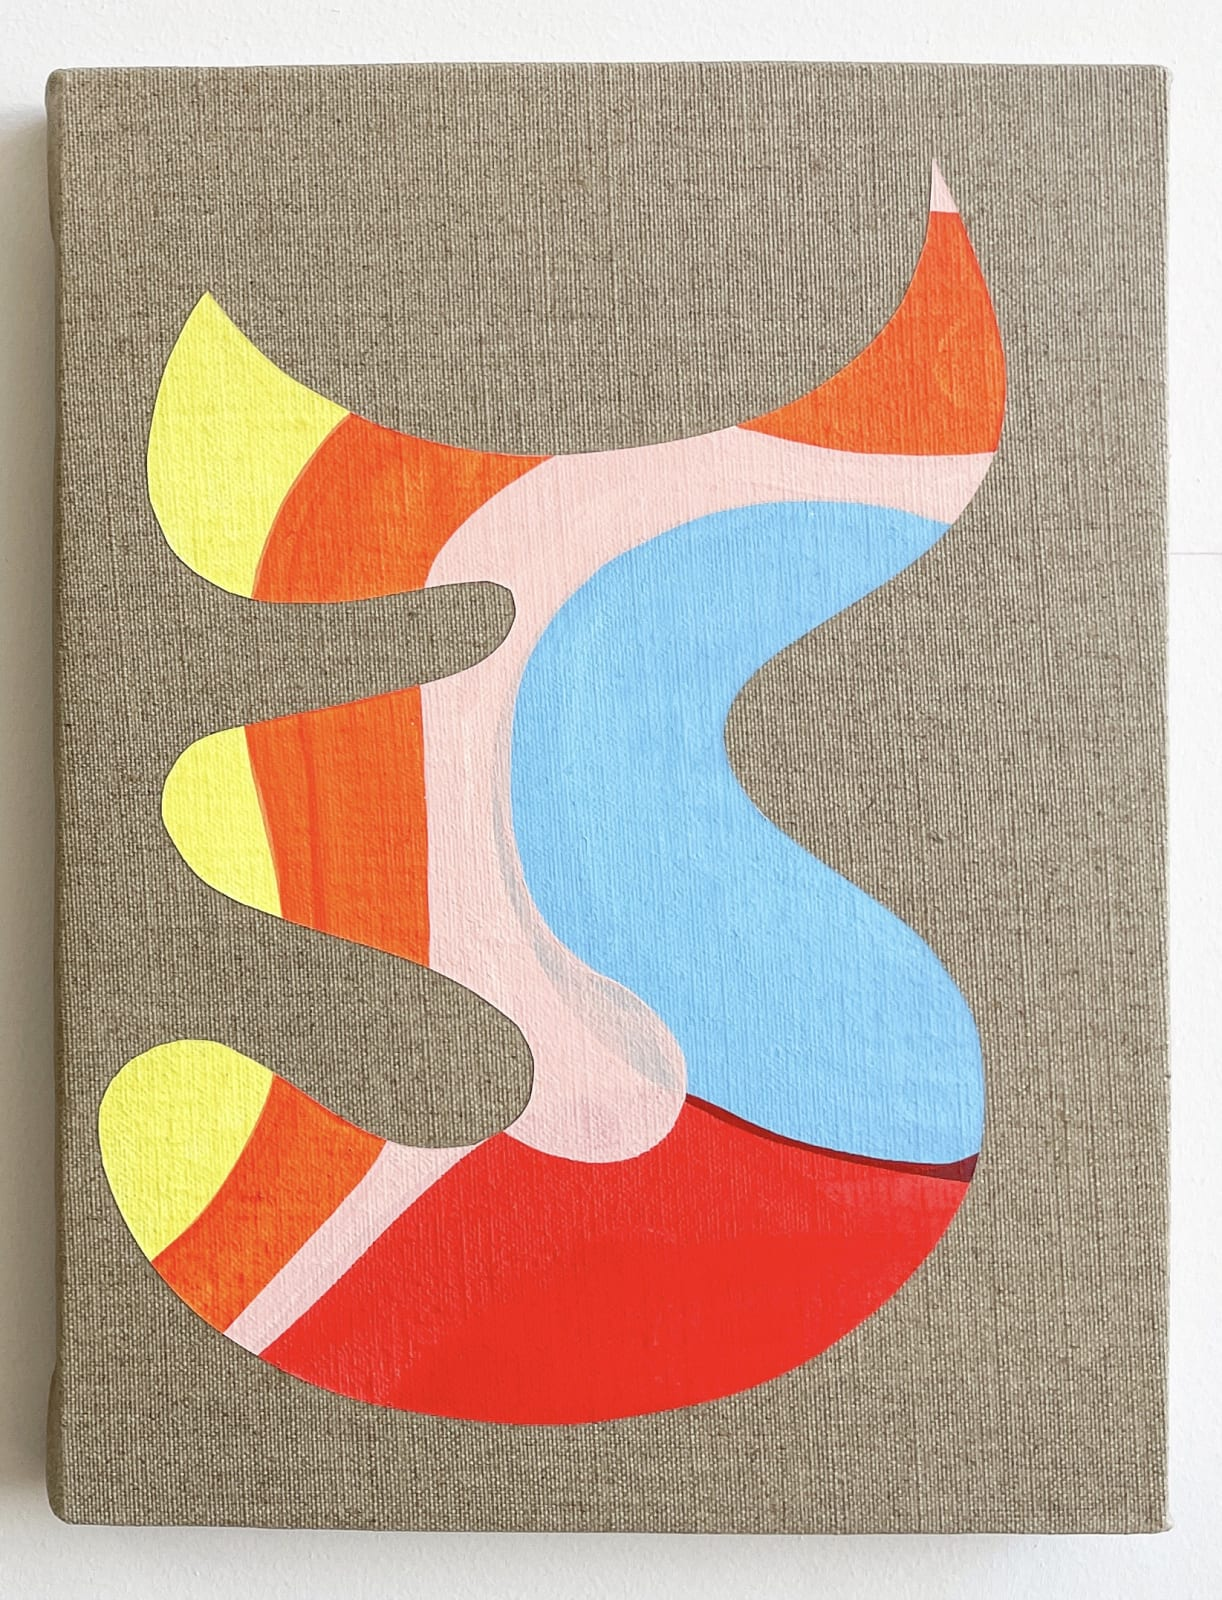 Carlos Rosales-Silva Diablito, 2021 Flashe on linen 12 x 9 x 2.5 in 30.5 x 22.9 x 6.3 cm